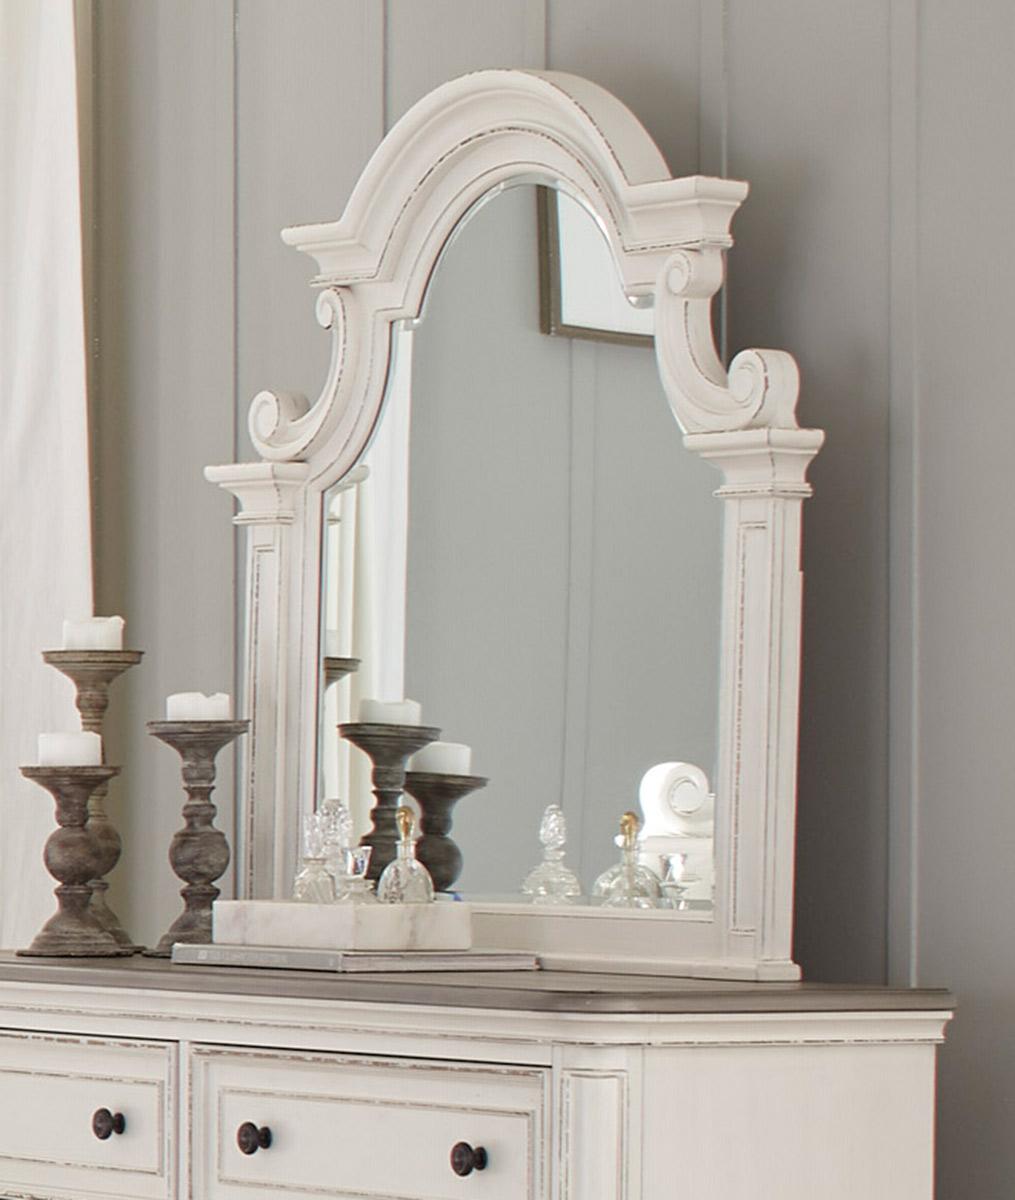 Homelegance Baylesford Mirror - Antique White Rub-Through Finish